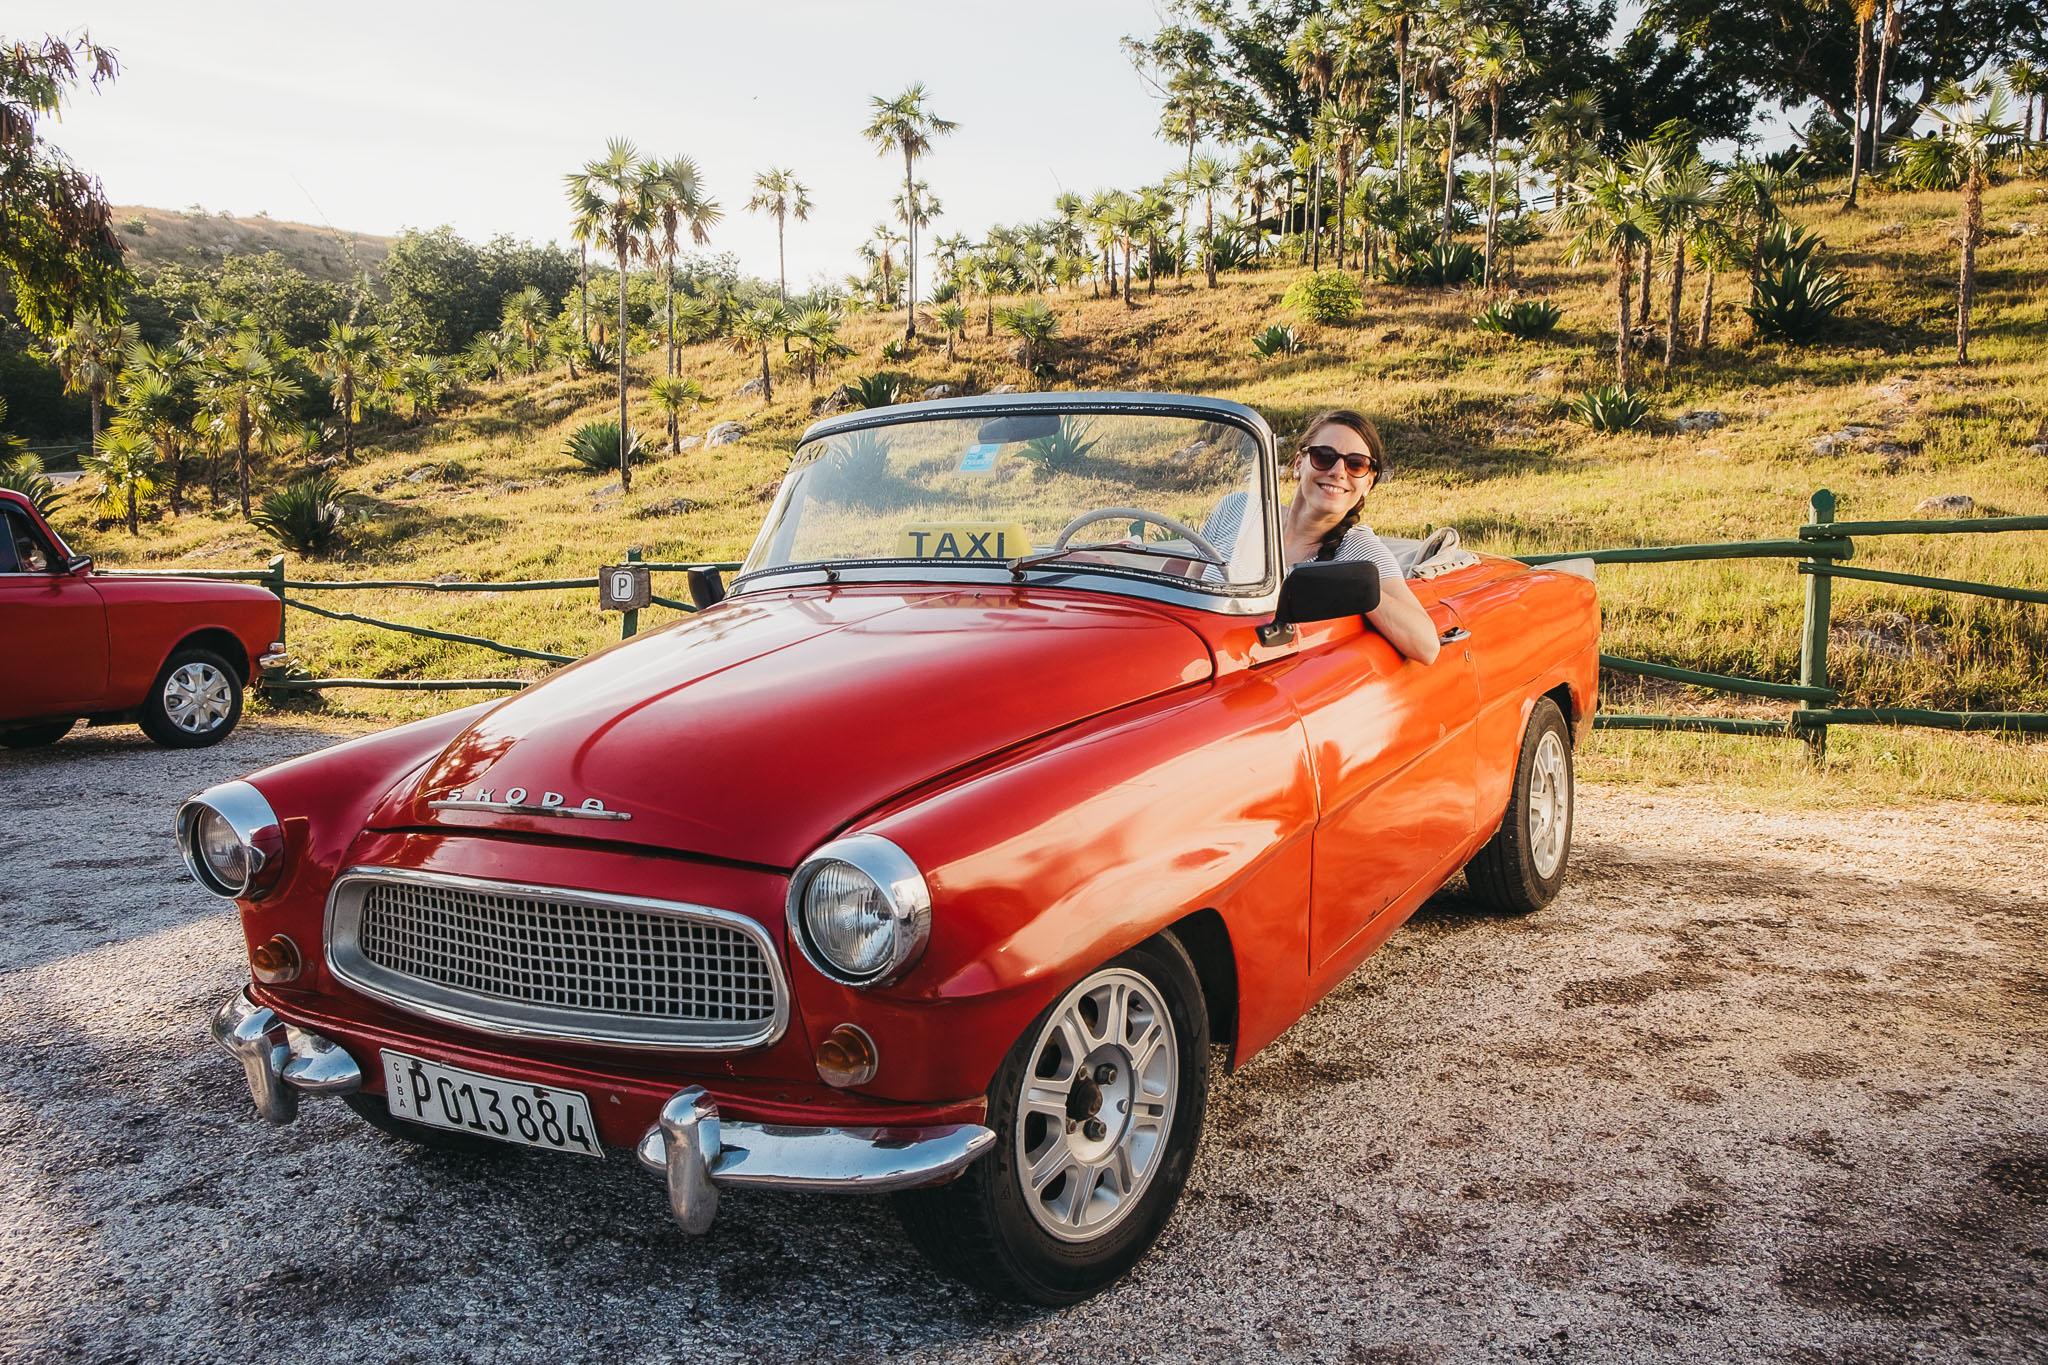 Cuba-2017-12-Trinidad-0319.jpg